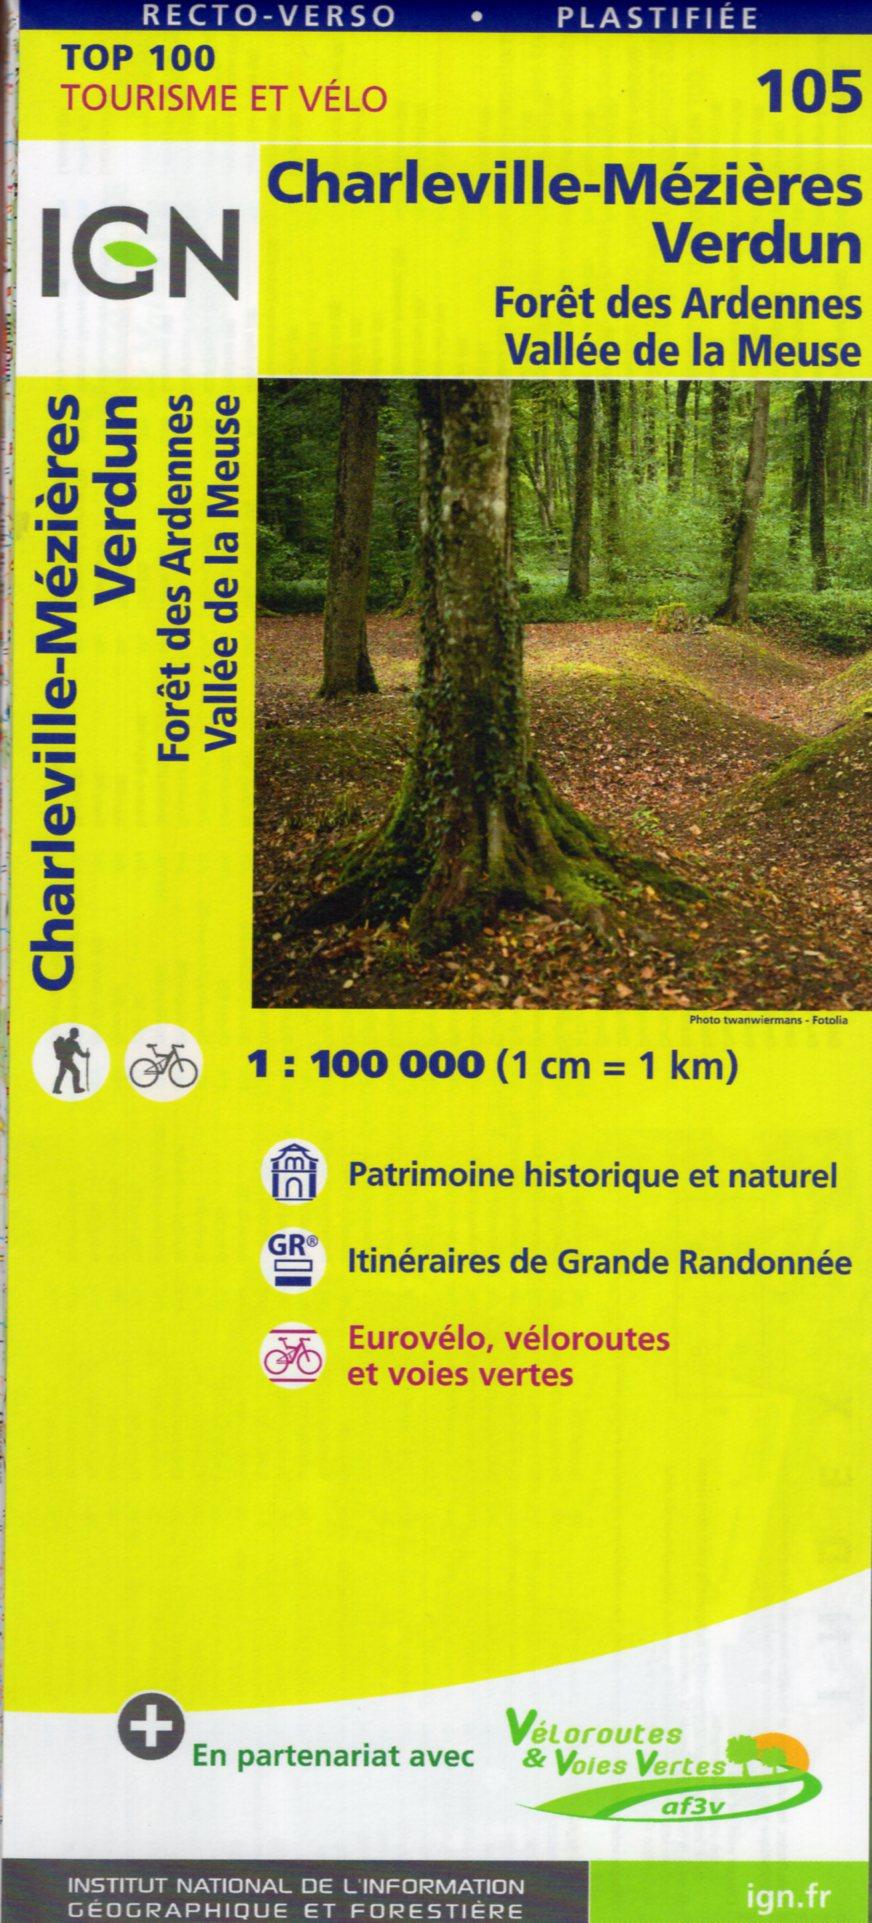 SV-105  Charleville-Mézières, Verdun | omgevingskaart / fietskaart 1:100.000 9782758540779  IGN Série Verte 1:100.000  Fietskaarten, Landkaarten en wegenkaarten Champagne, Franse Ardennen